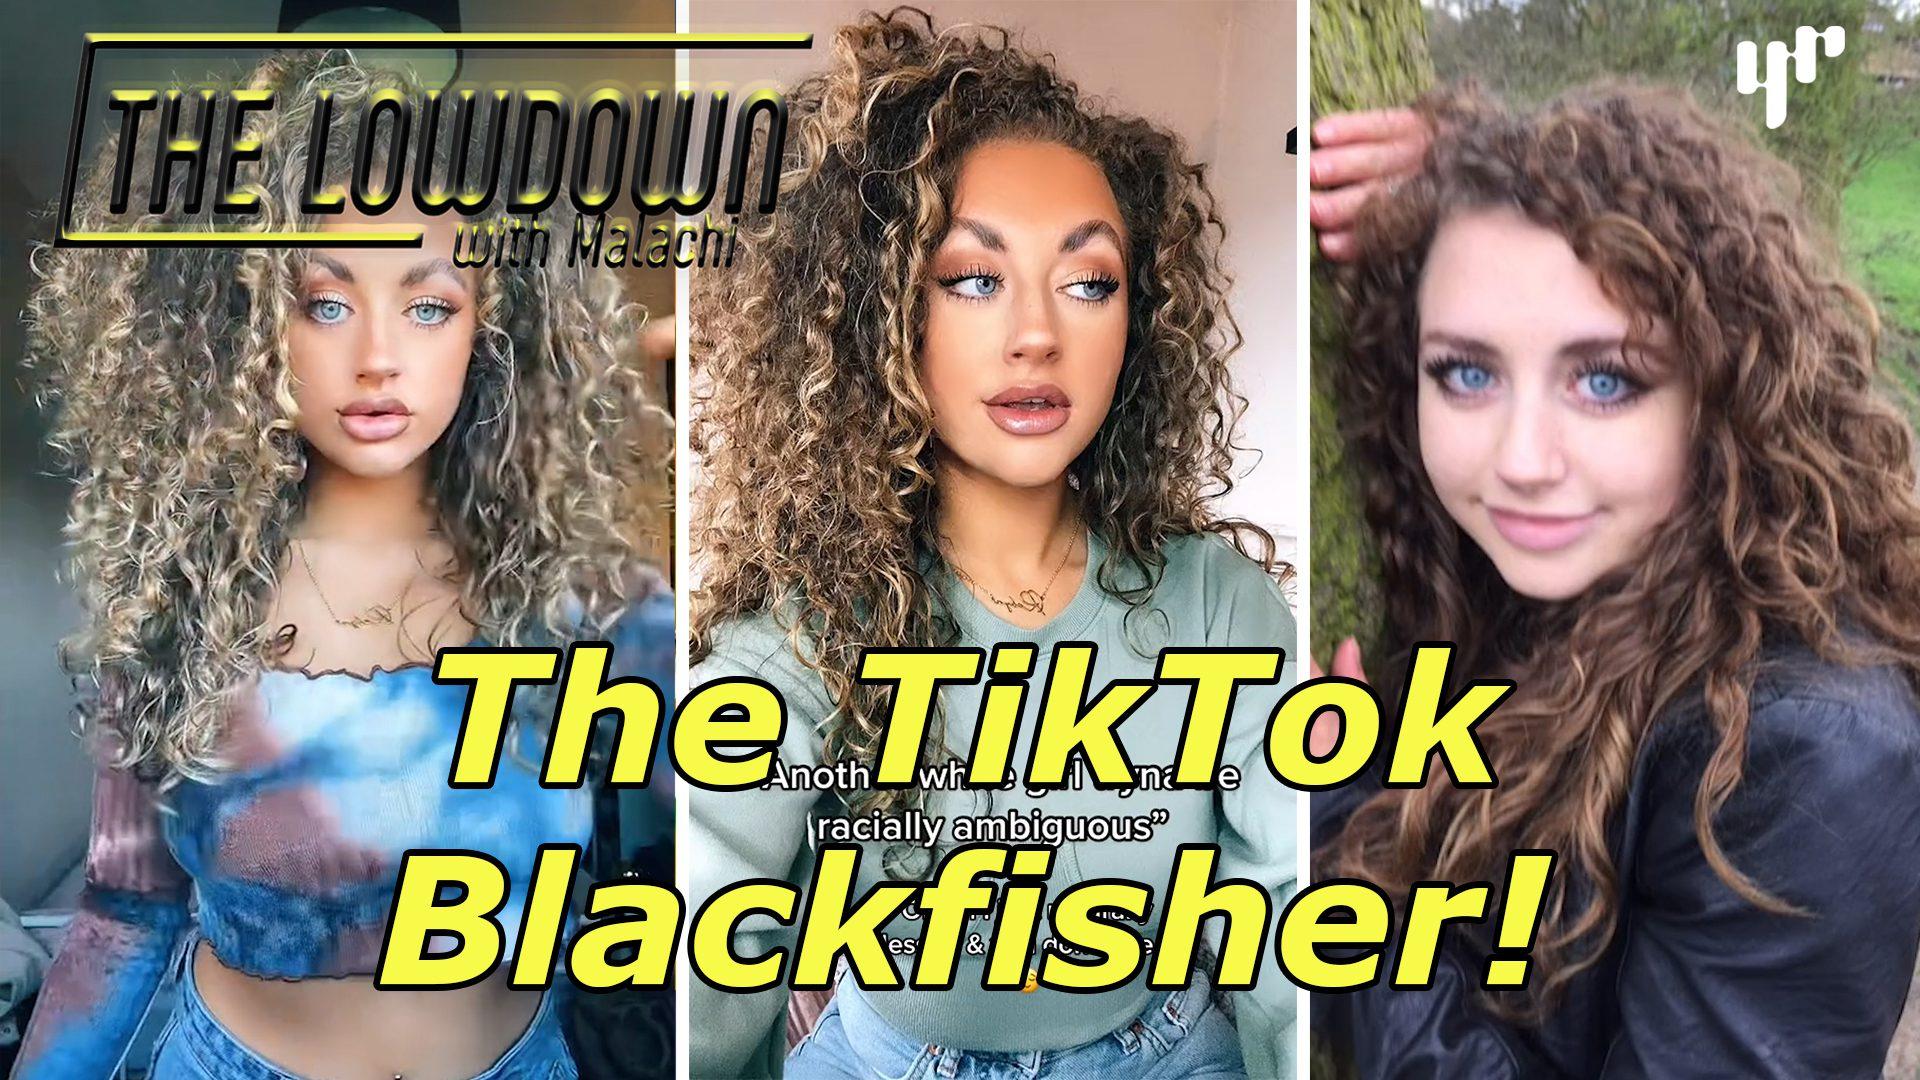 The Lowdown: Blackfishing Comes to TikTok!